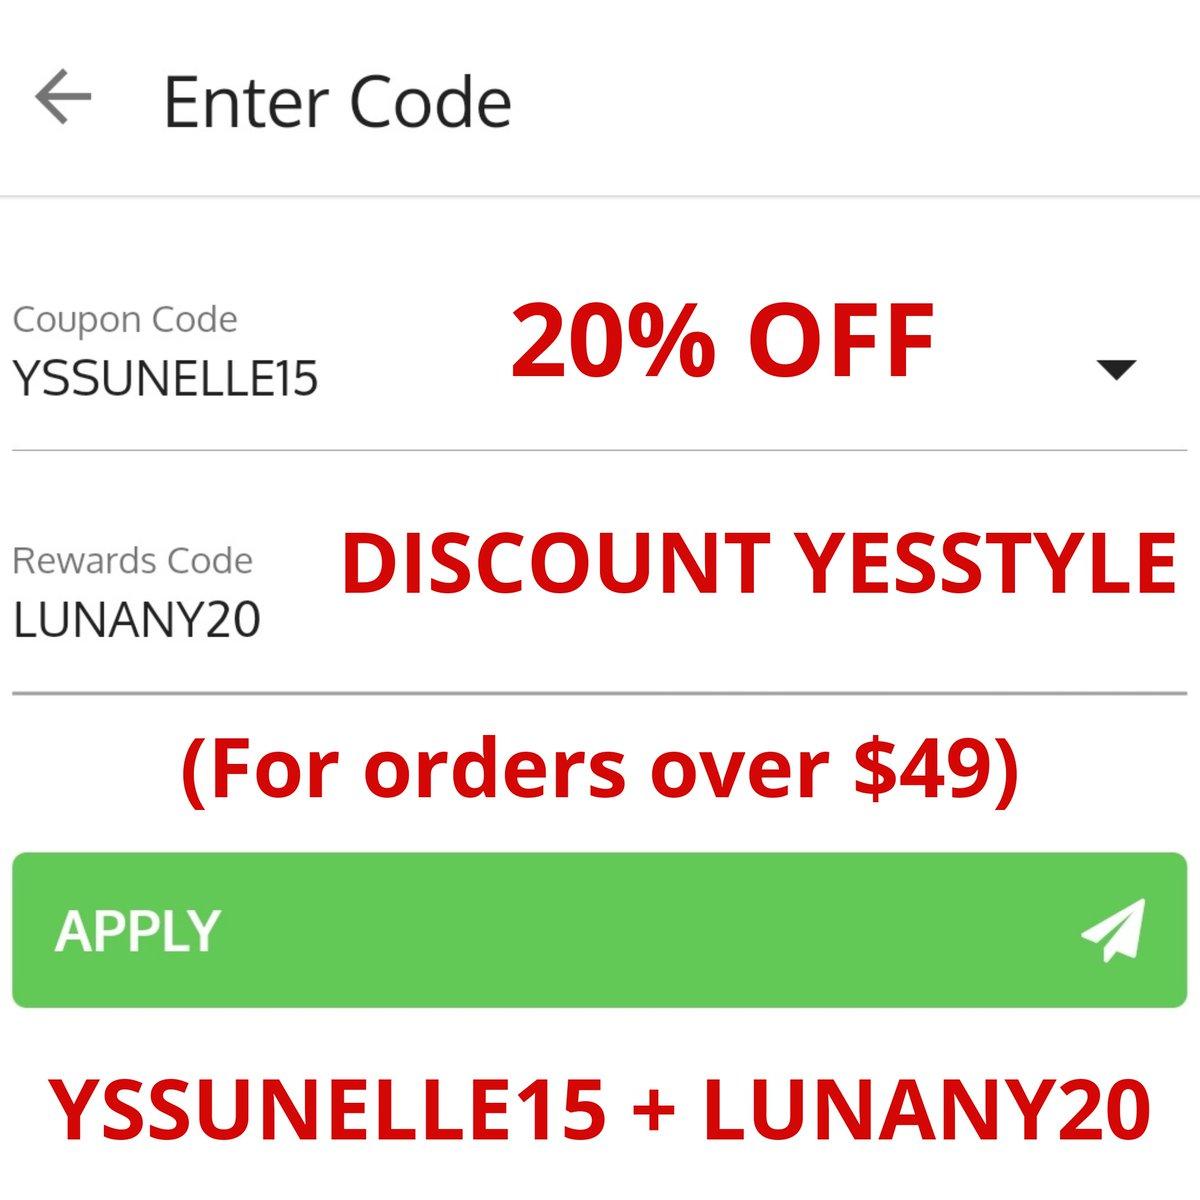 20% OFF YESSTYLE COUPON ♥️😍 YSSUNELLE15 + LUNANY20 (For orders over $49) #yesstyle #yesstylehaul #ootd #lfl #yesstylediscounts #fff #스커트 #koreanstyle  #ulzzang #kbeauty #Korean #kfashion